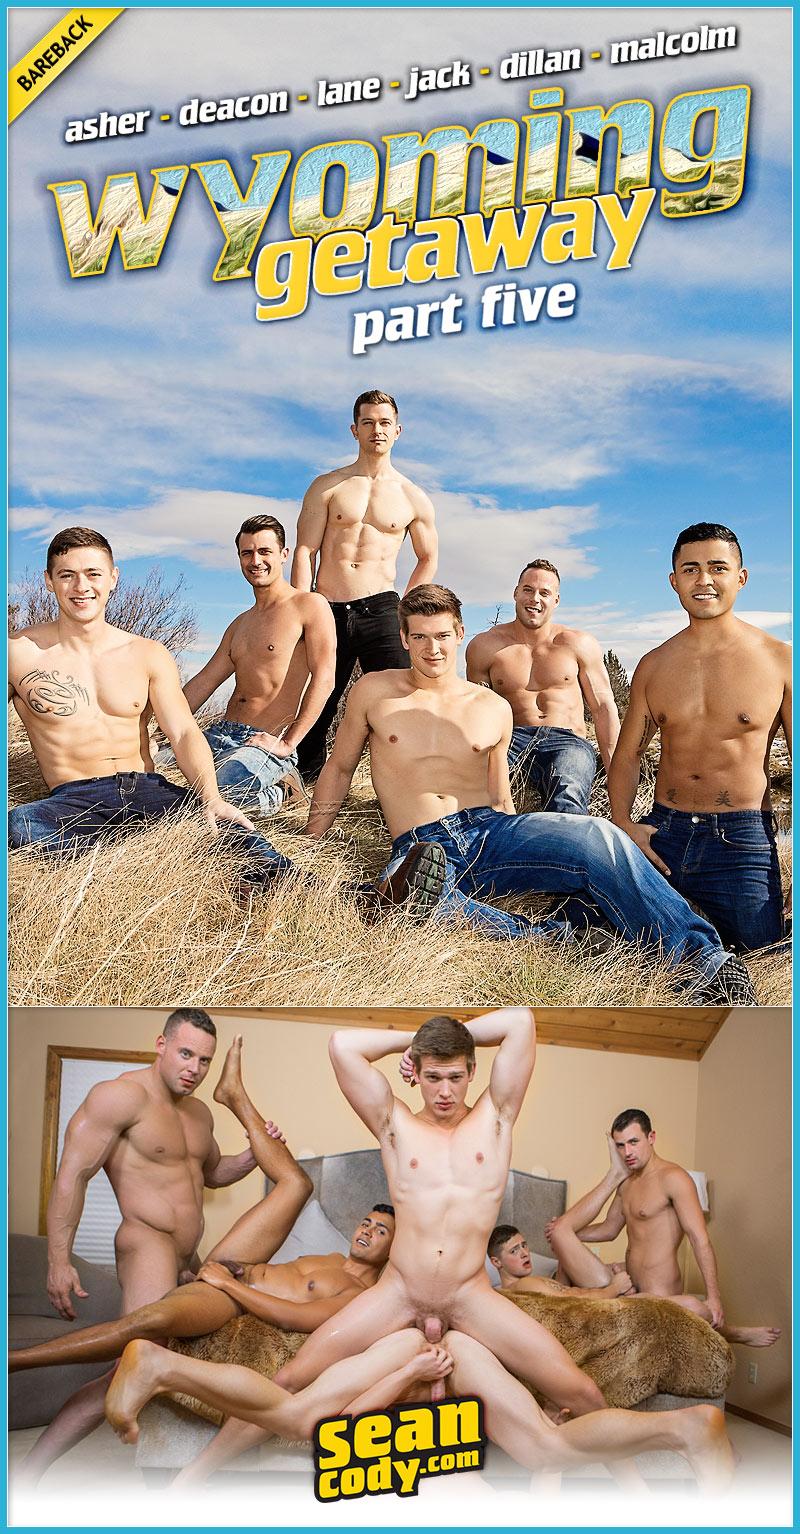 Sean Cody's Wyoming Getaway: FINALE (Asher, Deacon, Lane, Jack, Dillan & Malcolm) (Bareback) at SeanCody